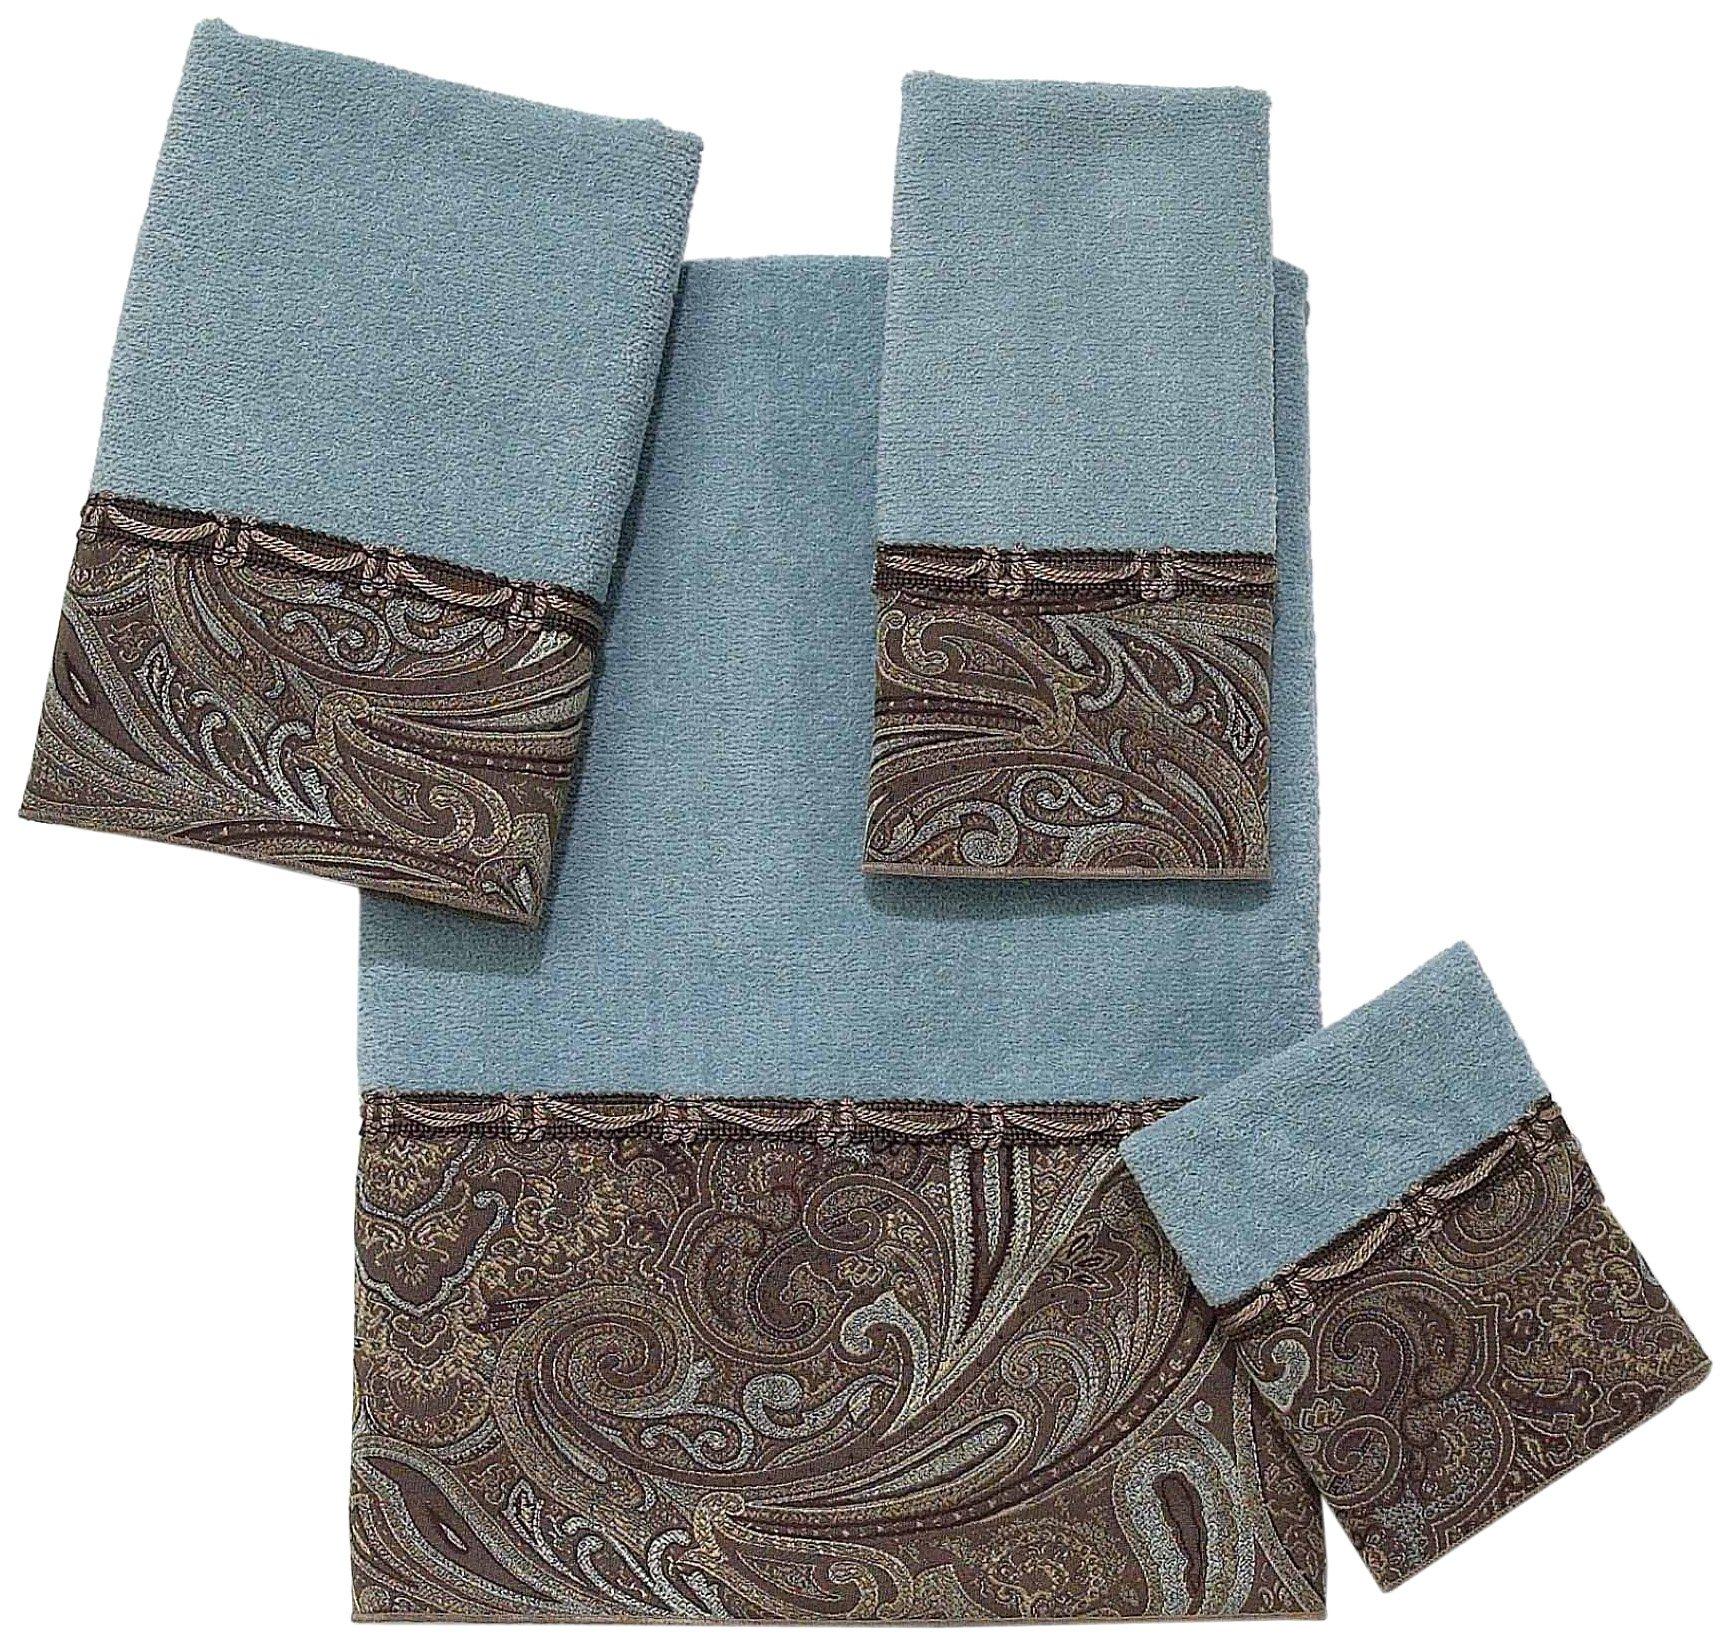 Avanti Linens Bradford  Embellished 4-Piece Decorative Towel Set Mineral